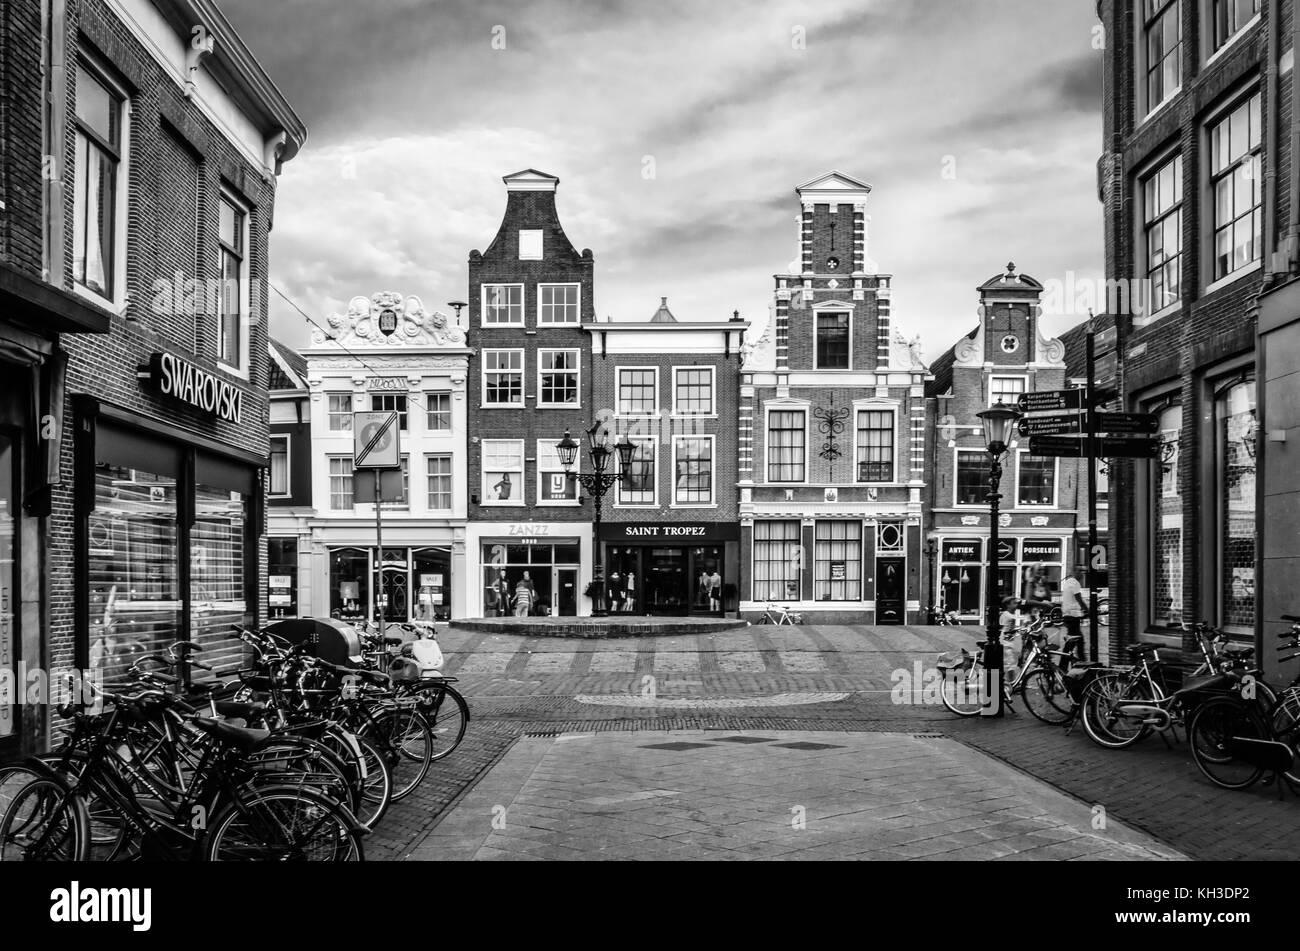 ALKMAAR, THE NETHERLANDS - AUGUST 25, 2013: Architecture in Alkmaar, the Netherlands, commercial street - Stock Image